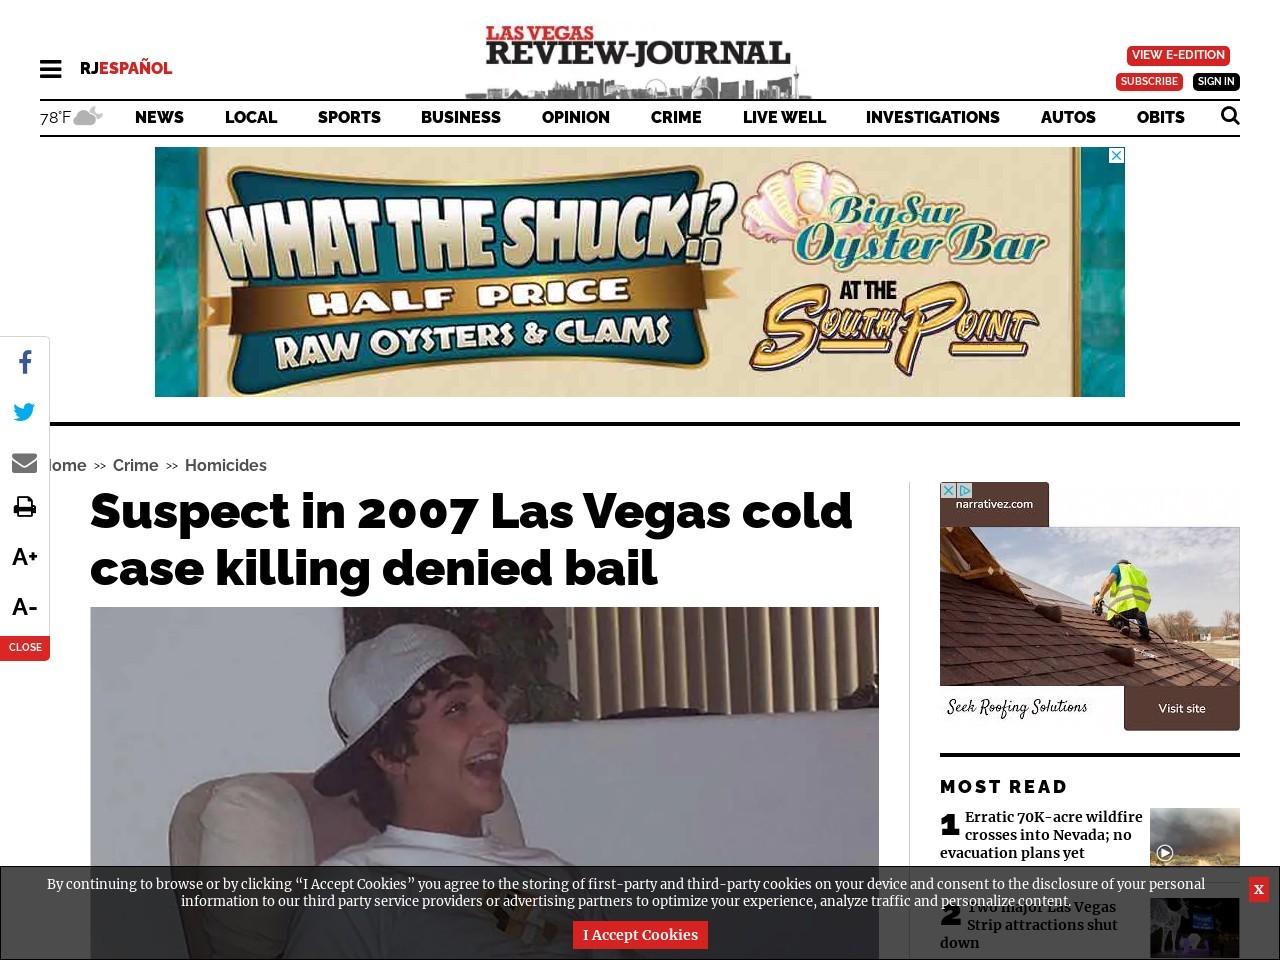 Las Vegas police have suspect in 2007 fatal shooting